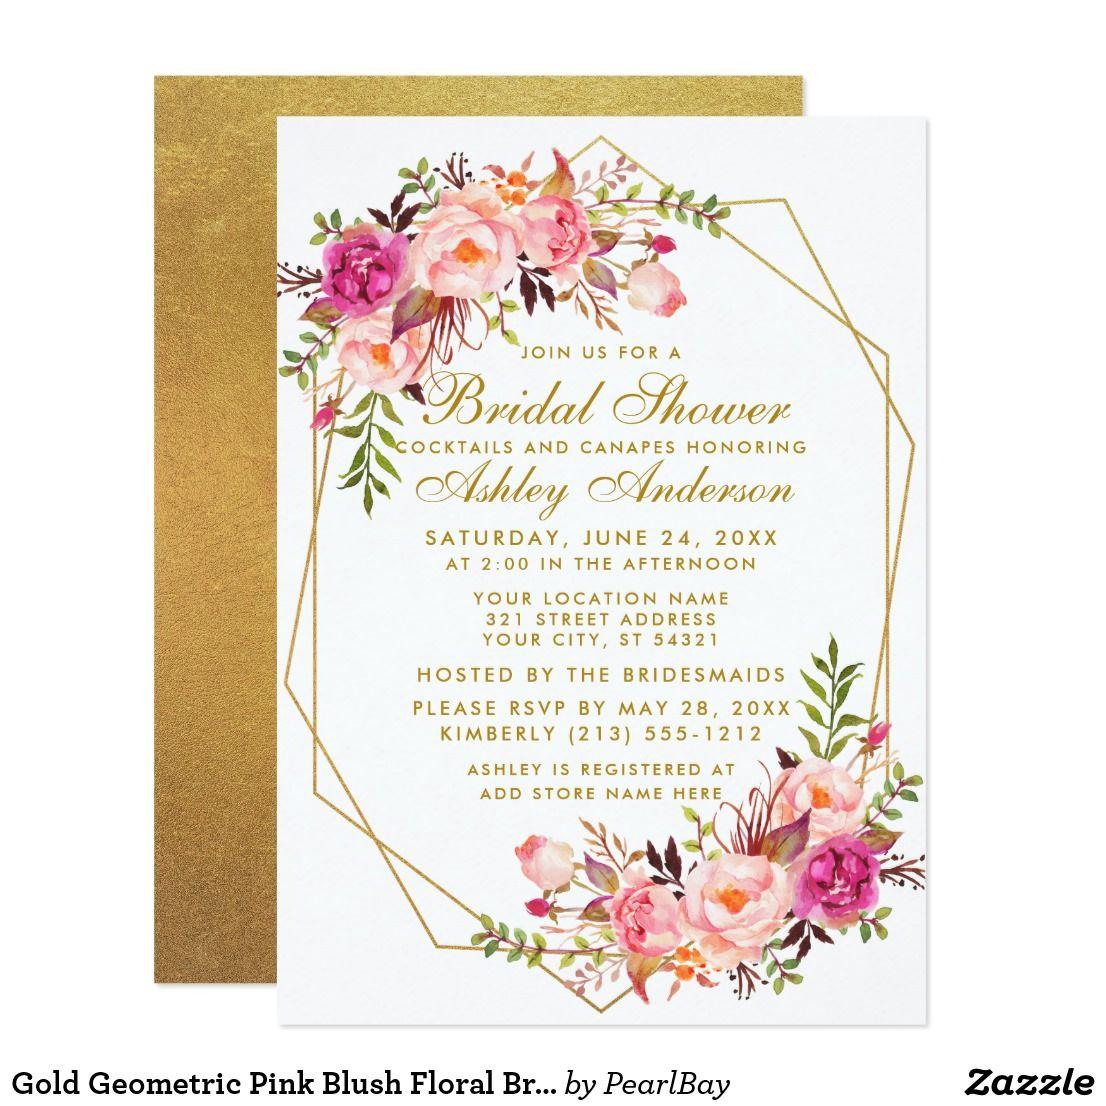 Gold Geometric Pink Blush Floral Bridal Shower Invitation zAZZLE.COM.AU… |  Geometric wedding invitation, Gold bridal shower invitations, Floral  wedding invitations